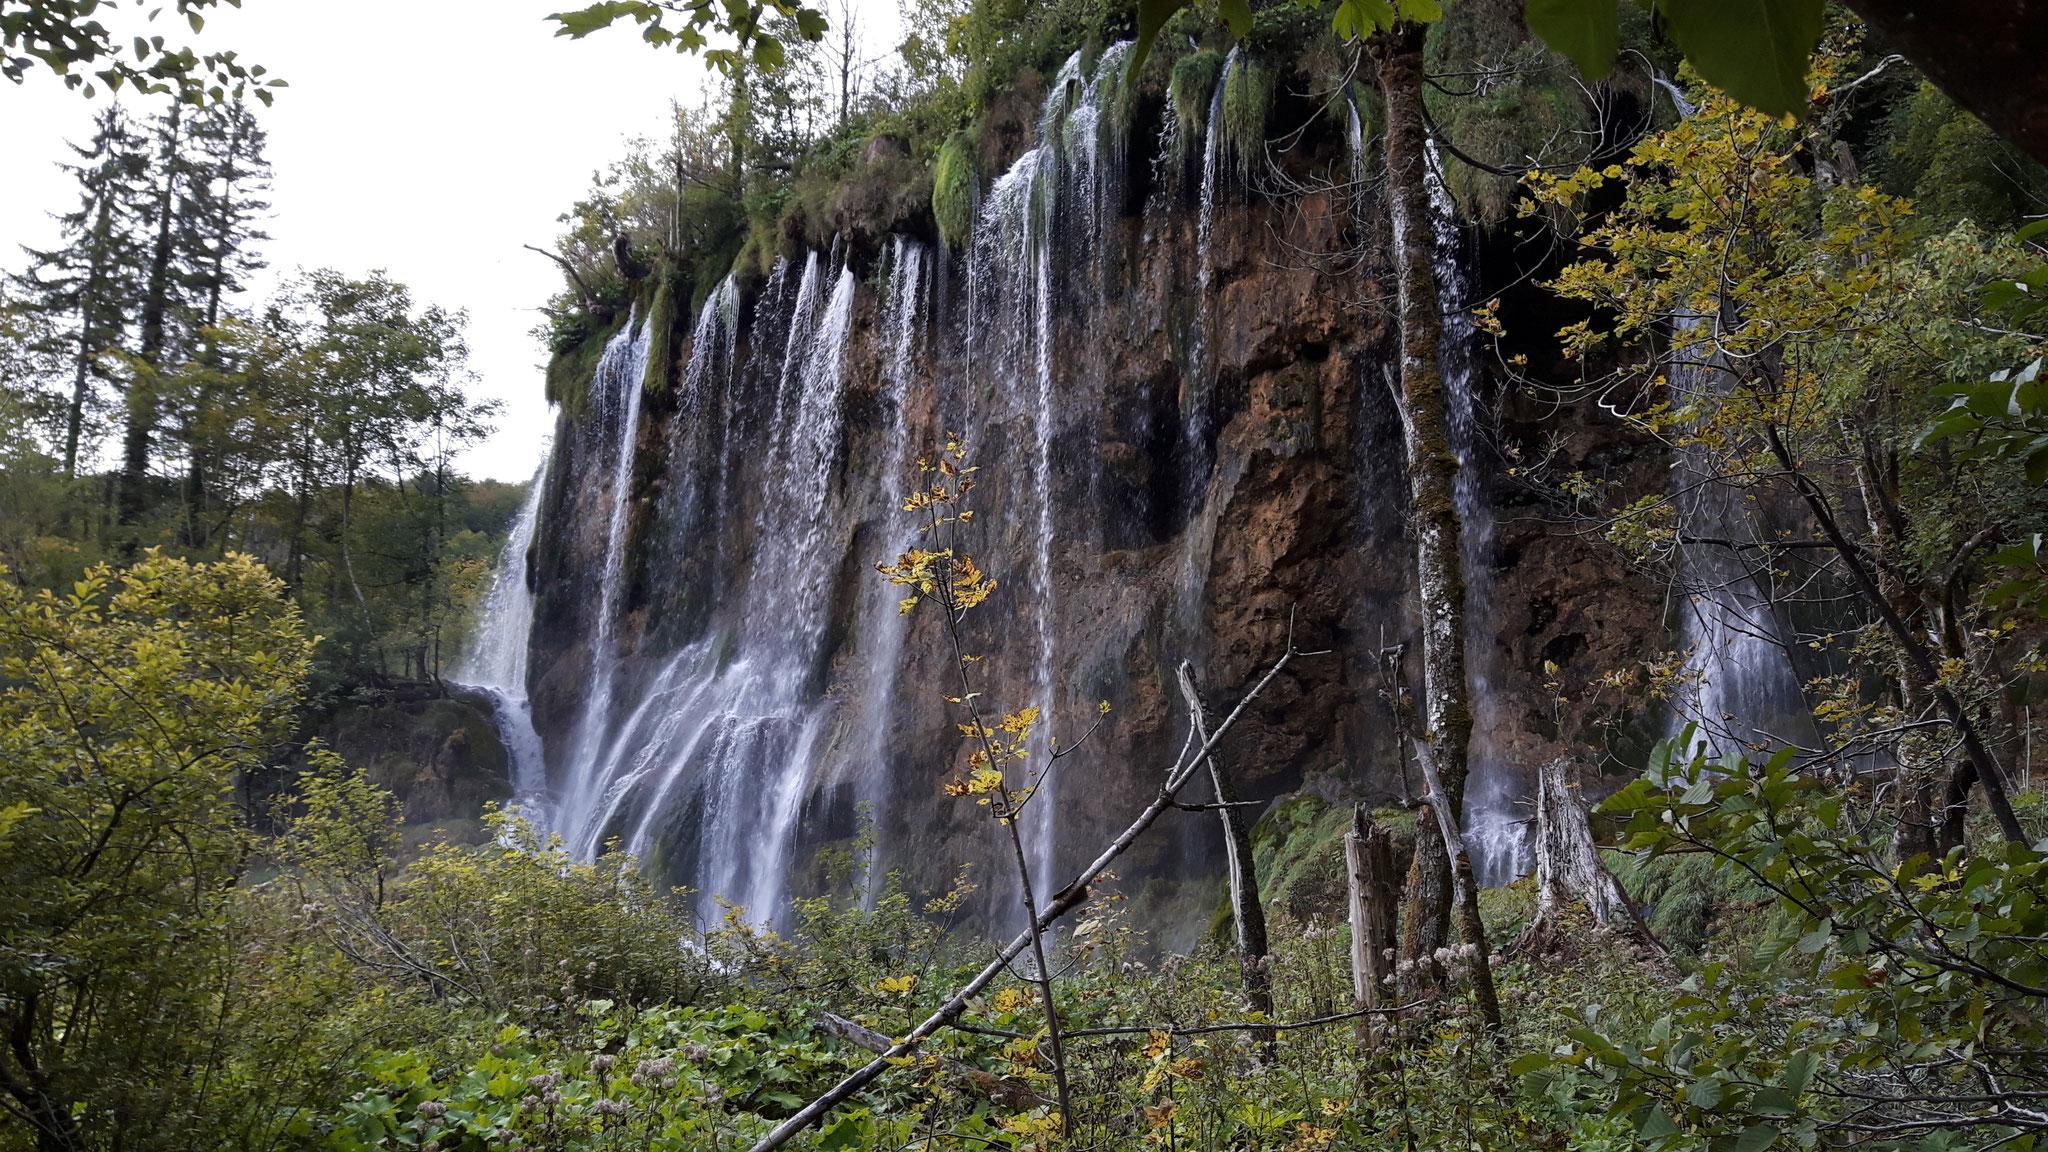 Wasserfall bei den Plitvitzer Seen